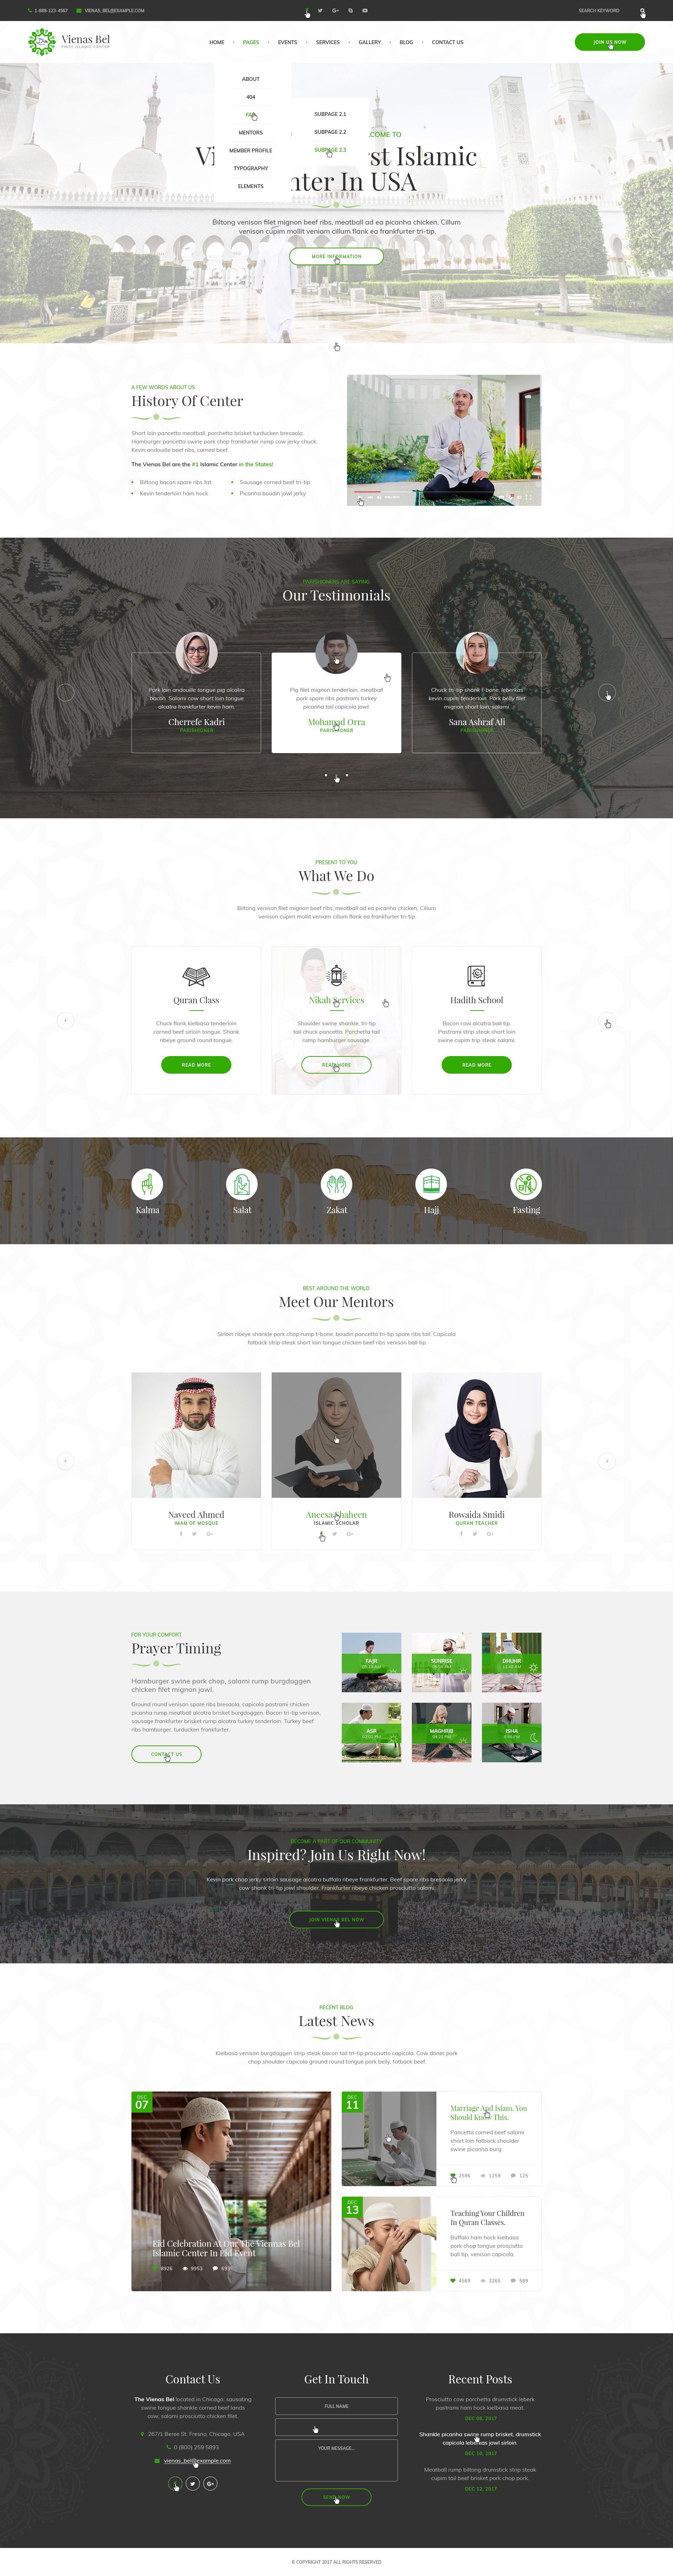 Merhaba - Islamic Center PSD Template by mwtemplates | ThemeForest